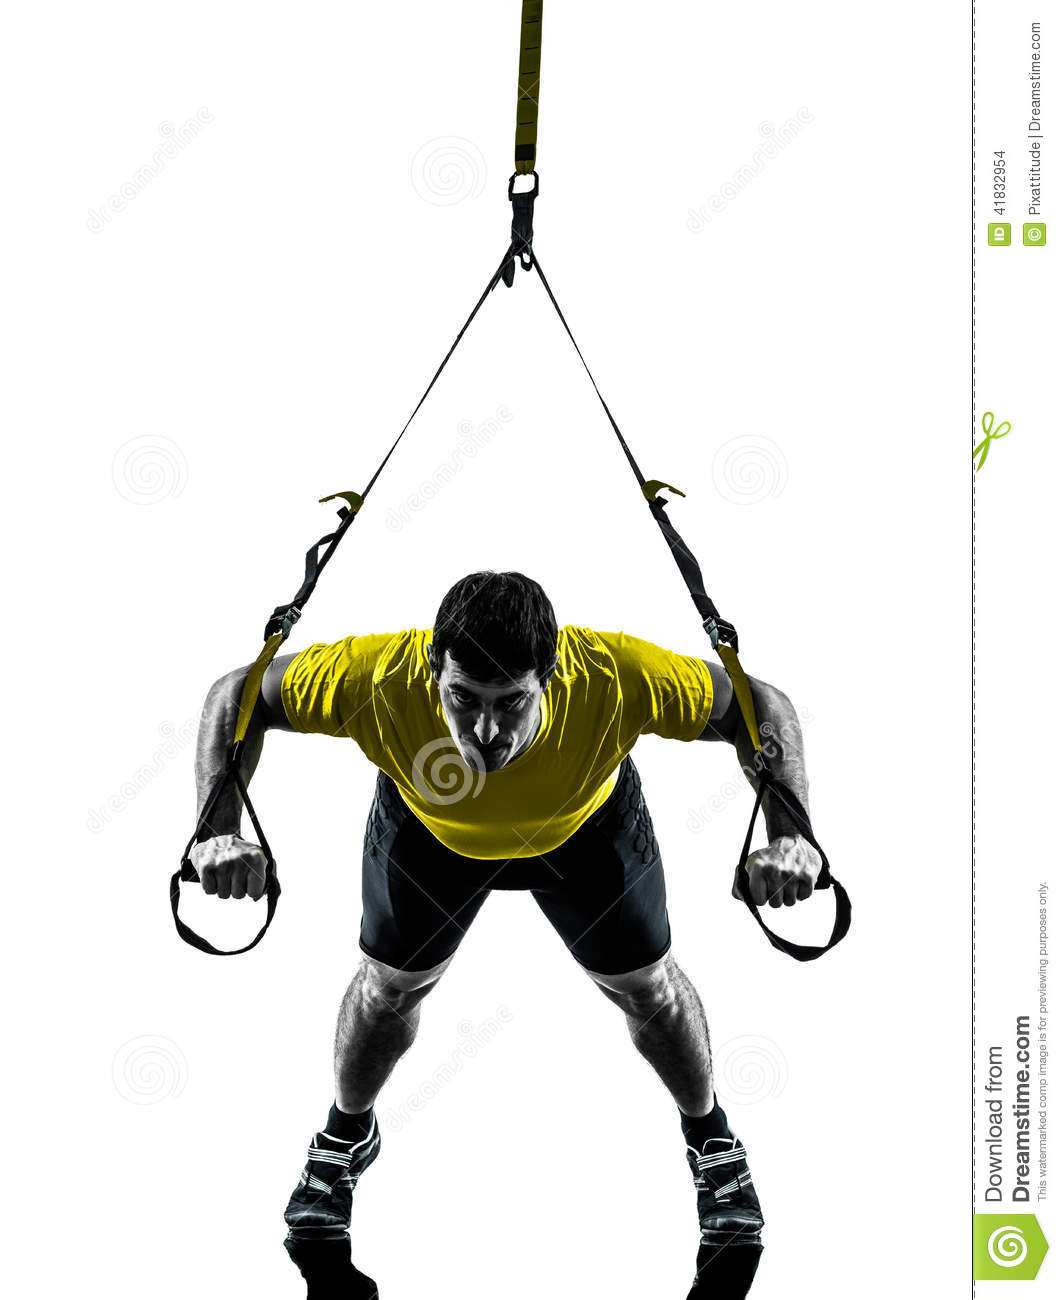 Man Exercising Suspension Training Trx Silhouette Stock Photo.